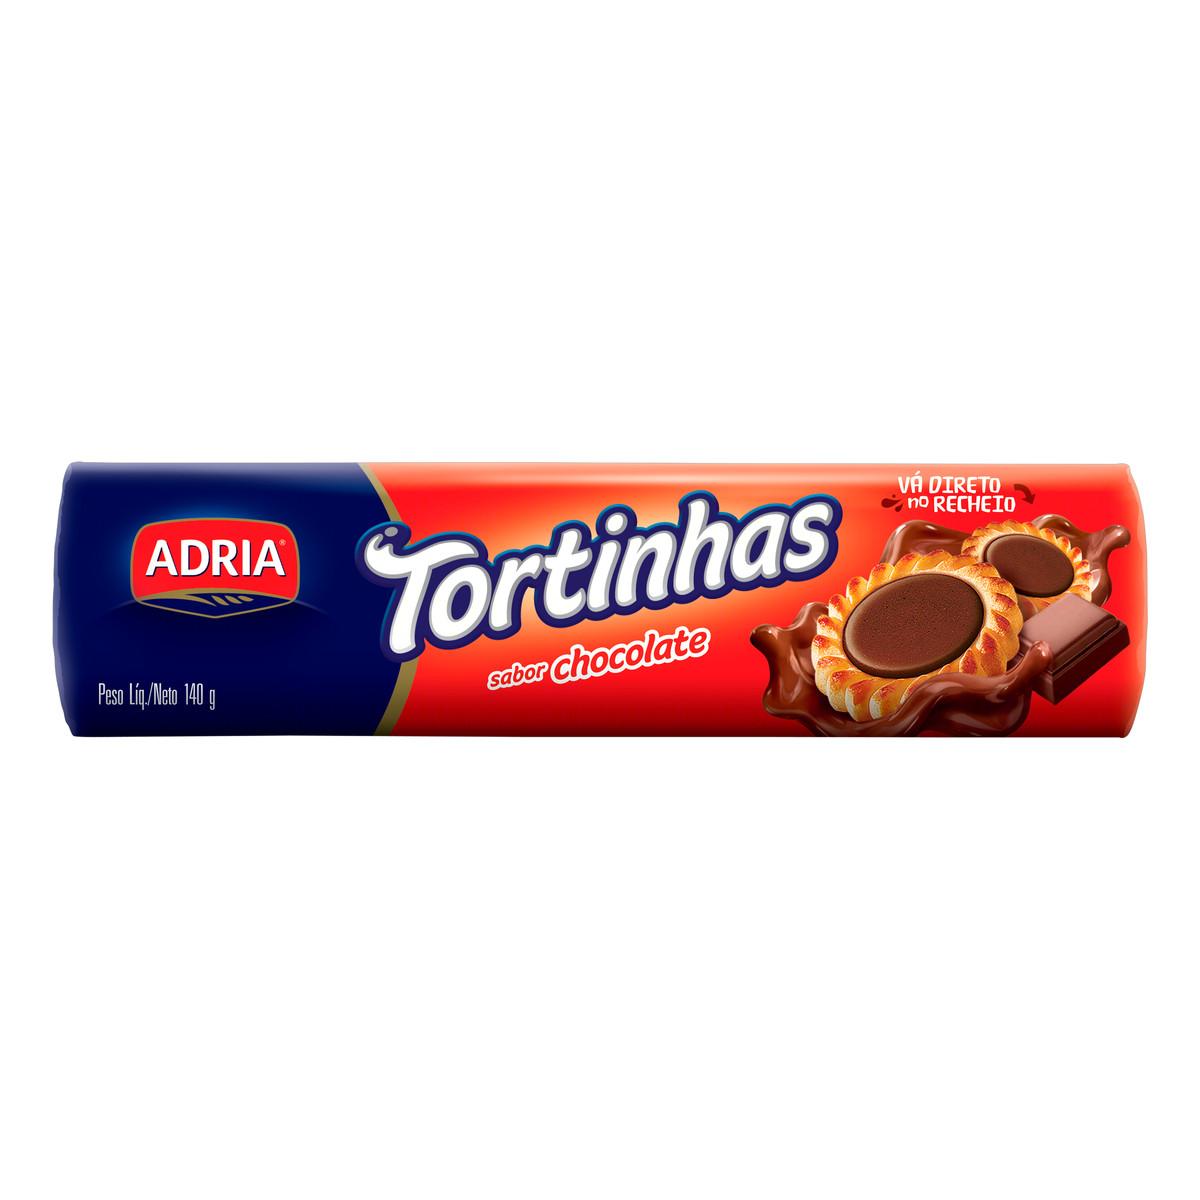 Biscoito recheado tortinha de chocolate 140g Adria pacote PCT